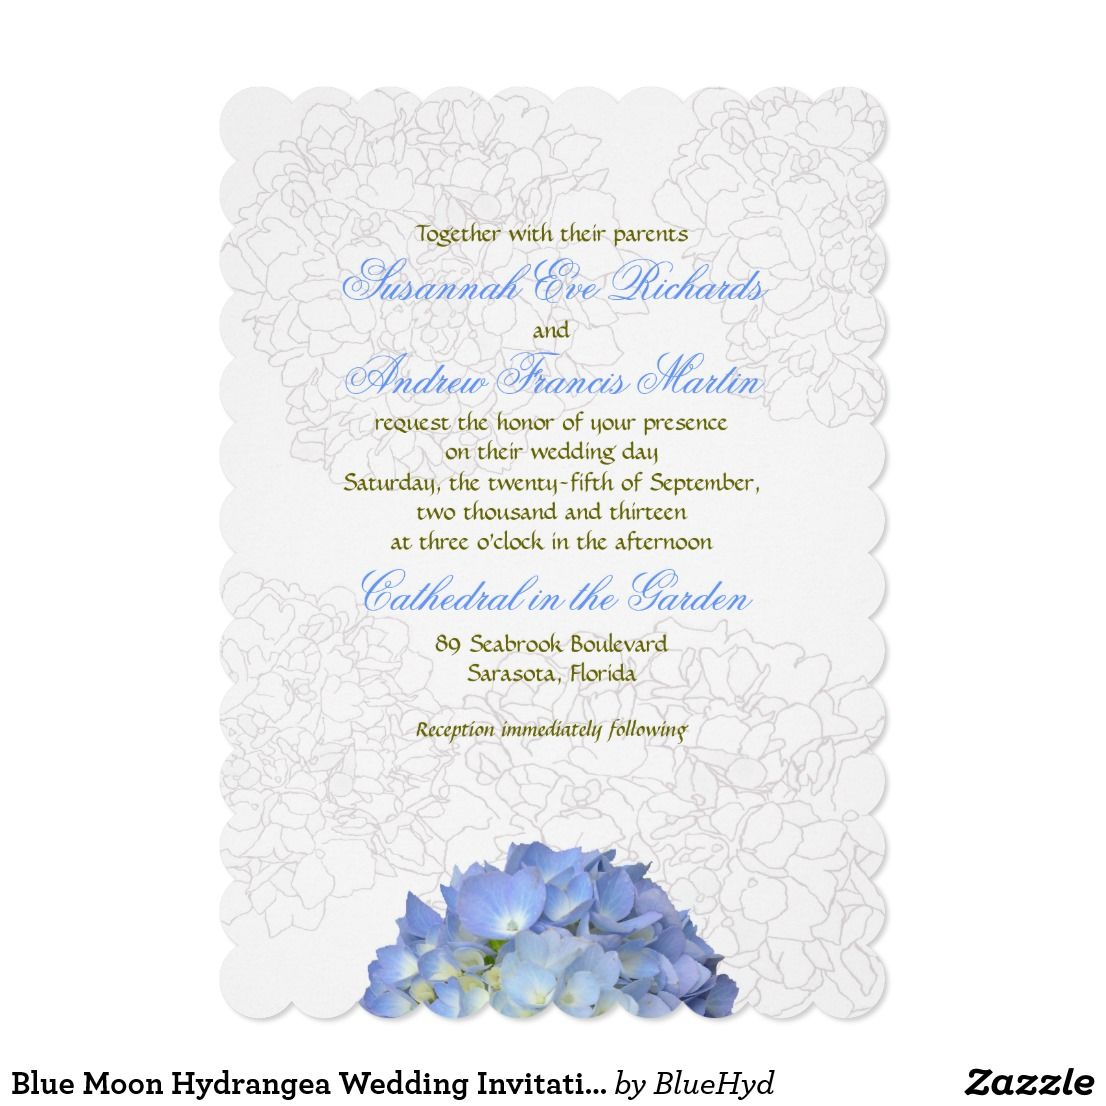 Blue Moon Hydrangea Wedding Invitation: Blue Moon Wedding Invitations At Websimilar.org